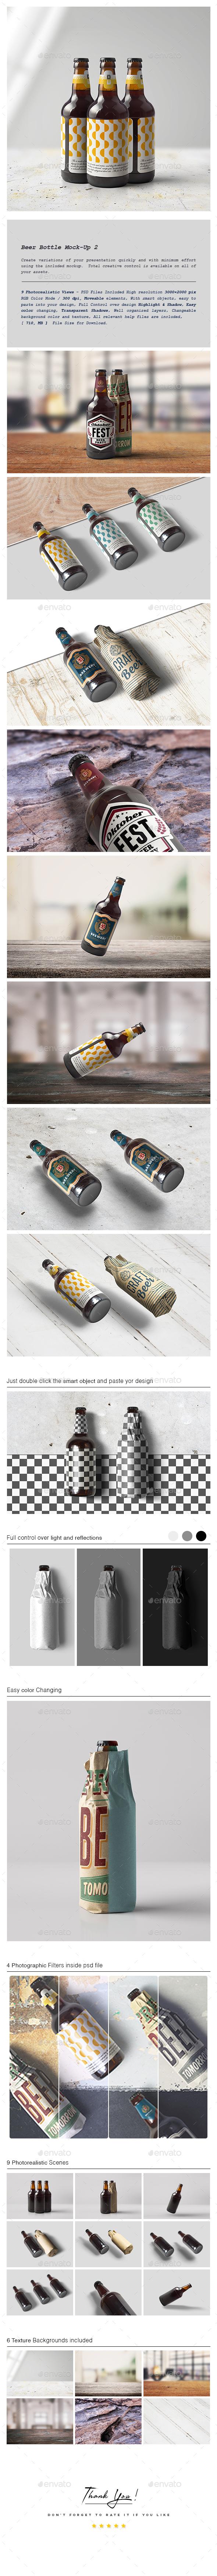 Beer Bottle Mock-Up 2 - Food and Drink Packaging